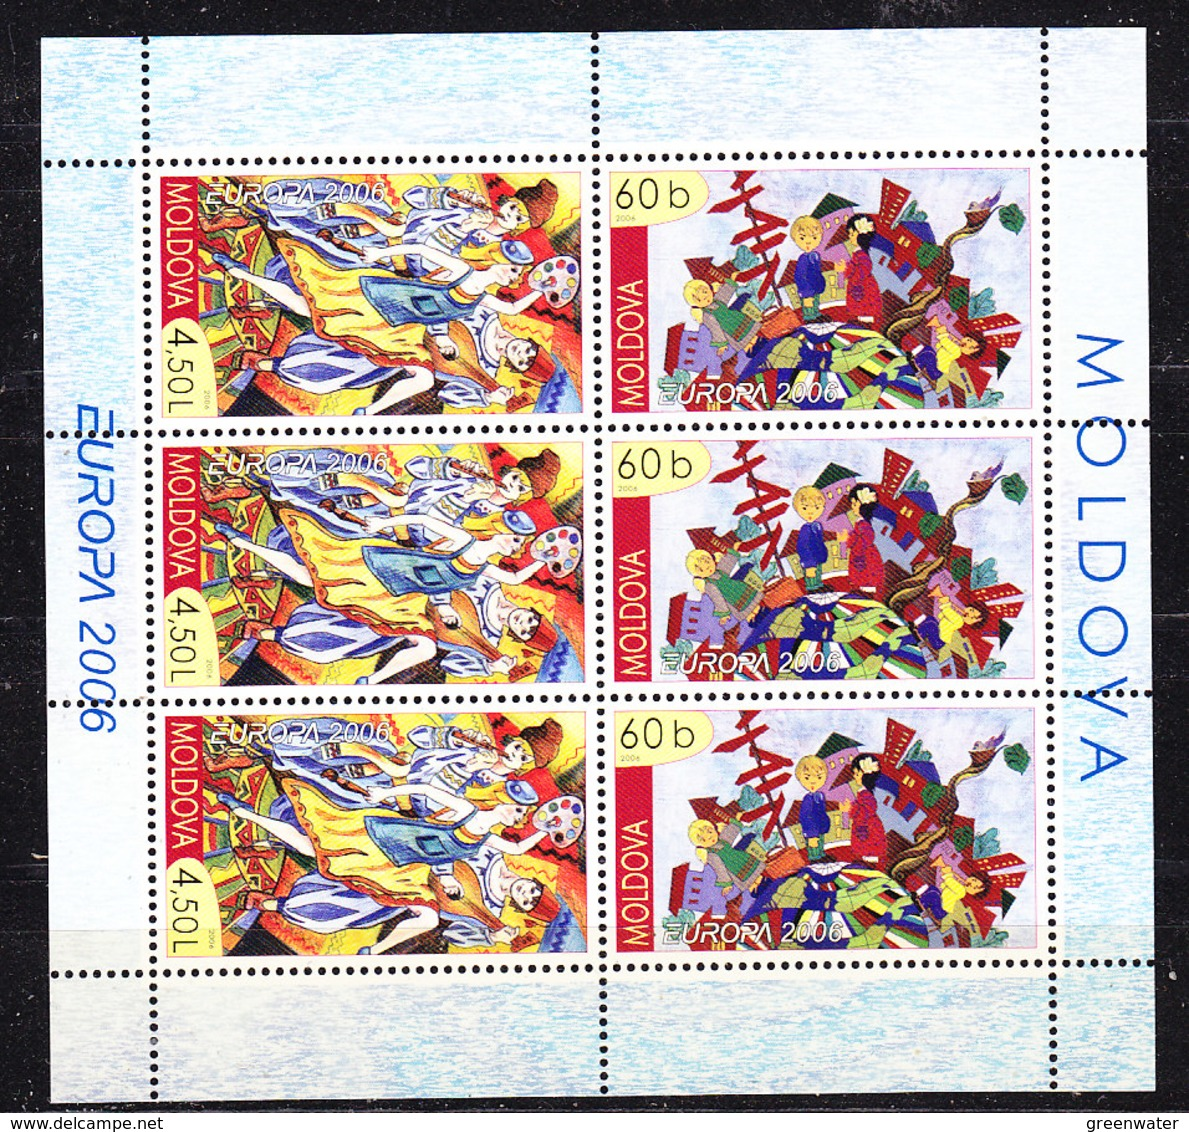 Europa Cept 2006 Moldova Booklet Pane ** Mnh (39142) - 2006